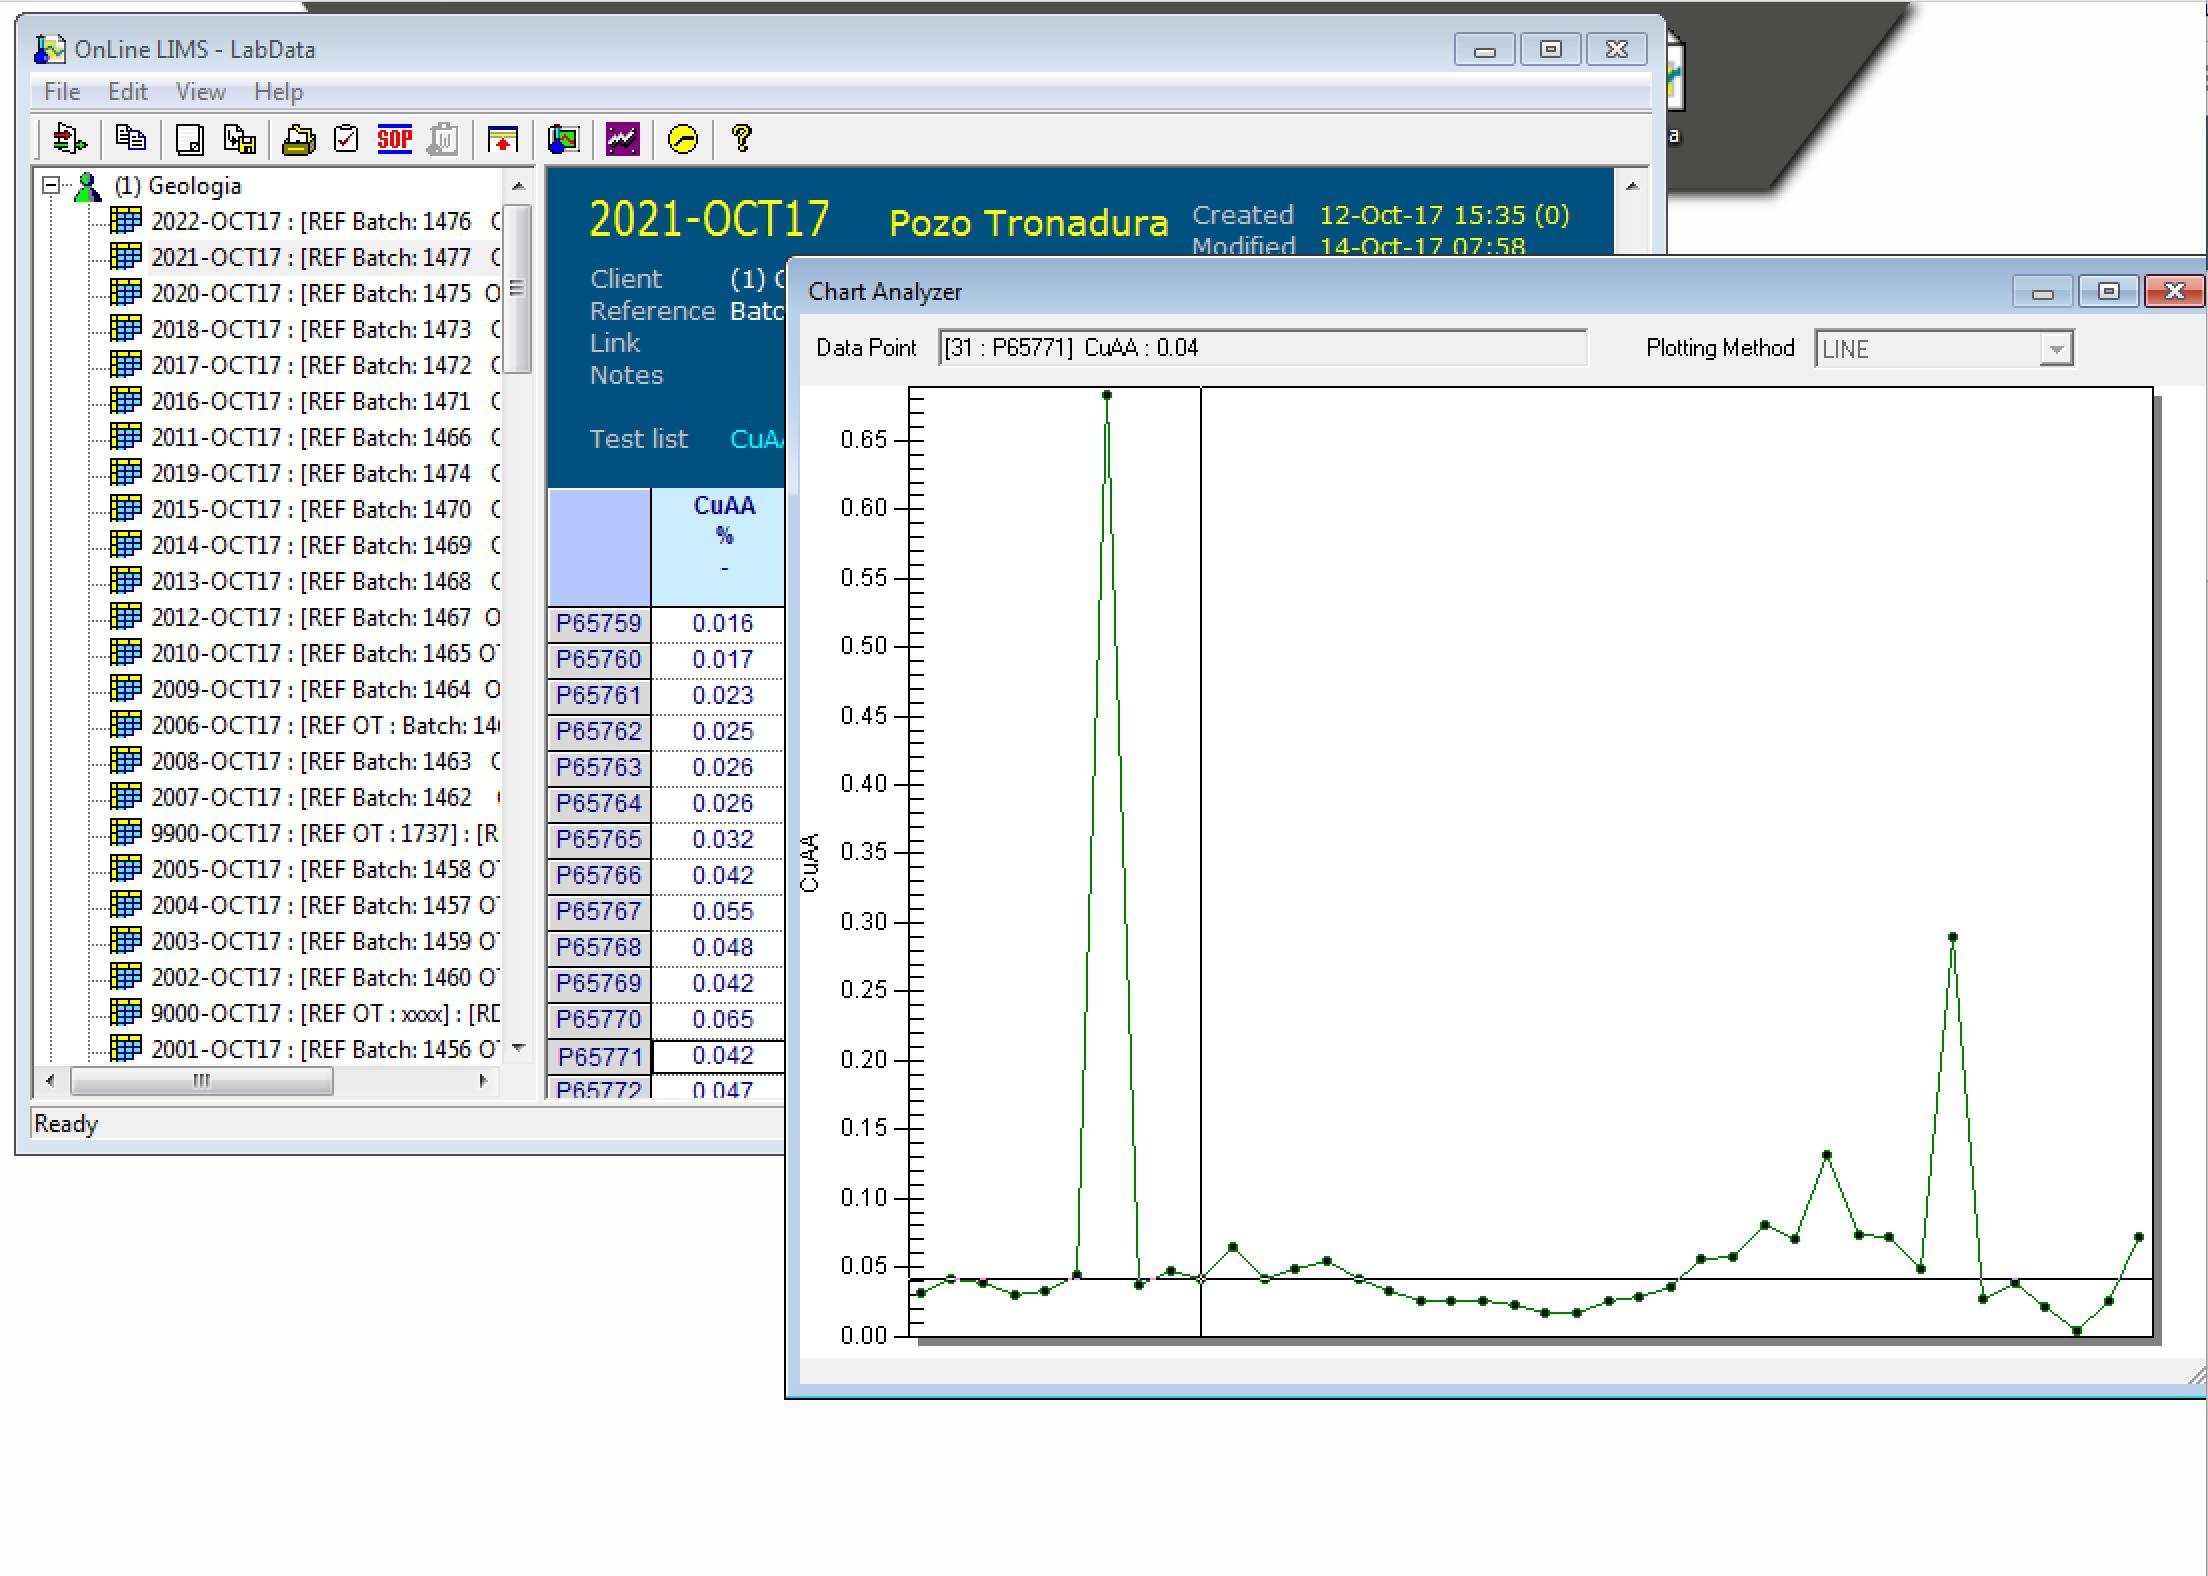 Chromeleon Chromatography Data System (CDS) vs LIMS